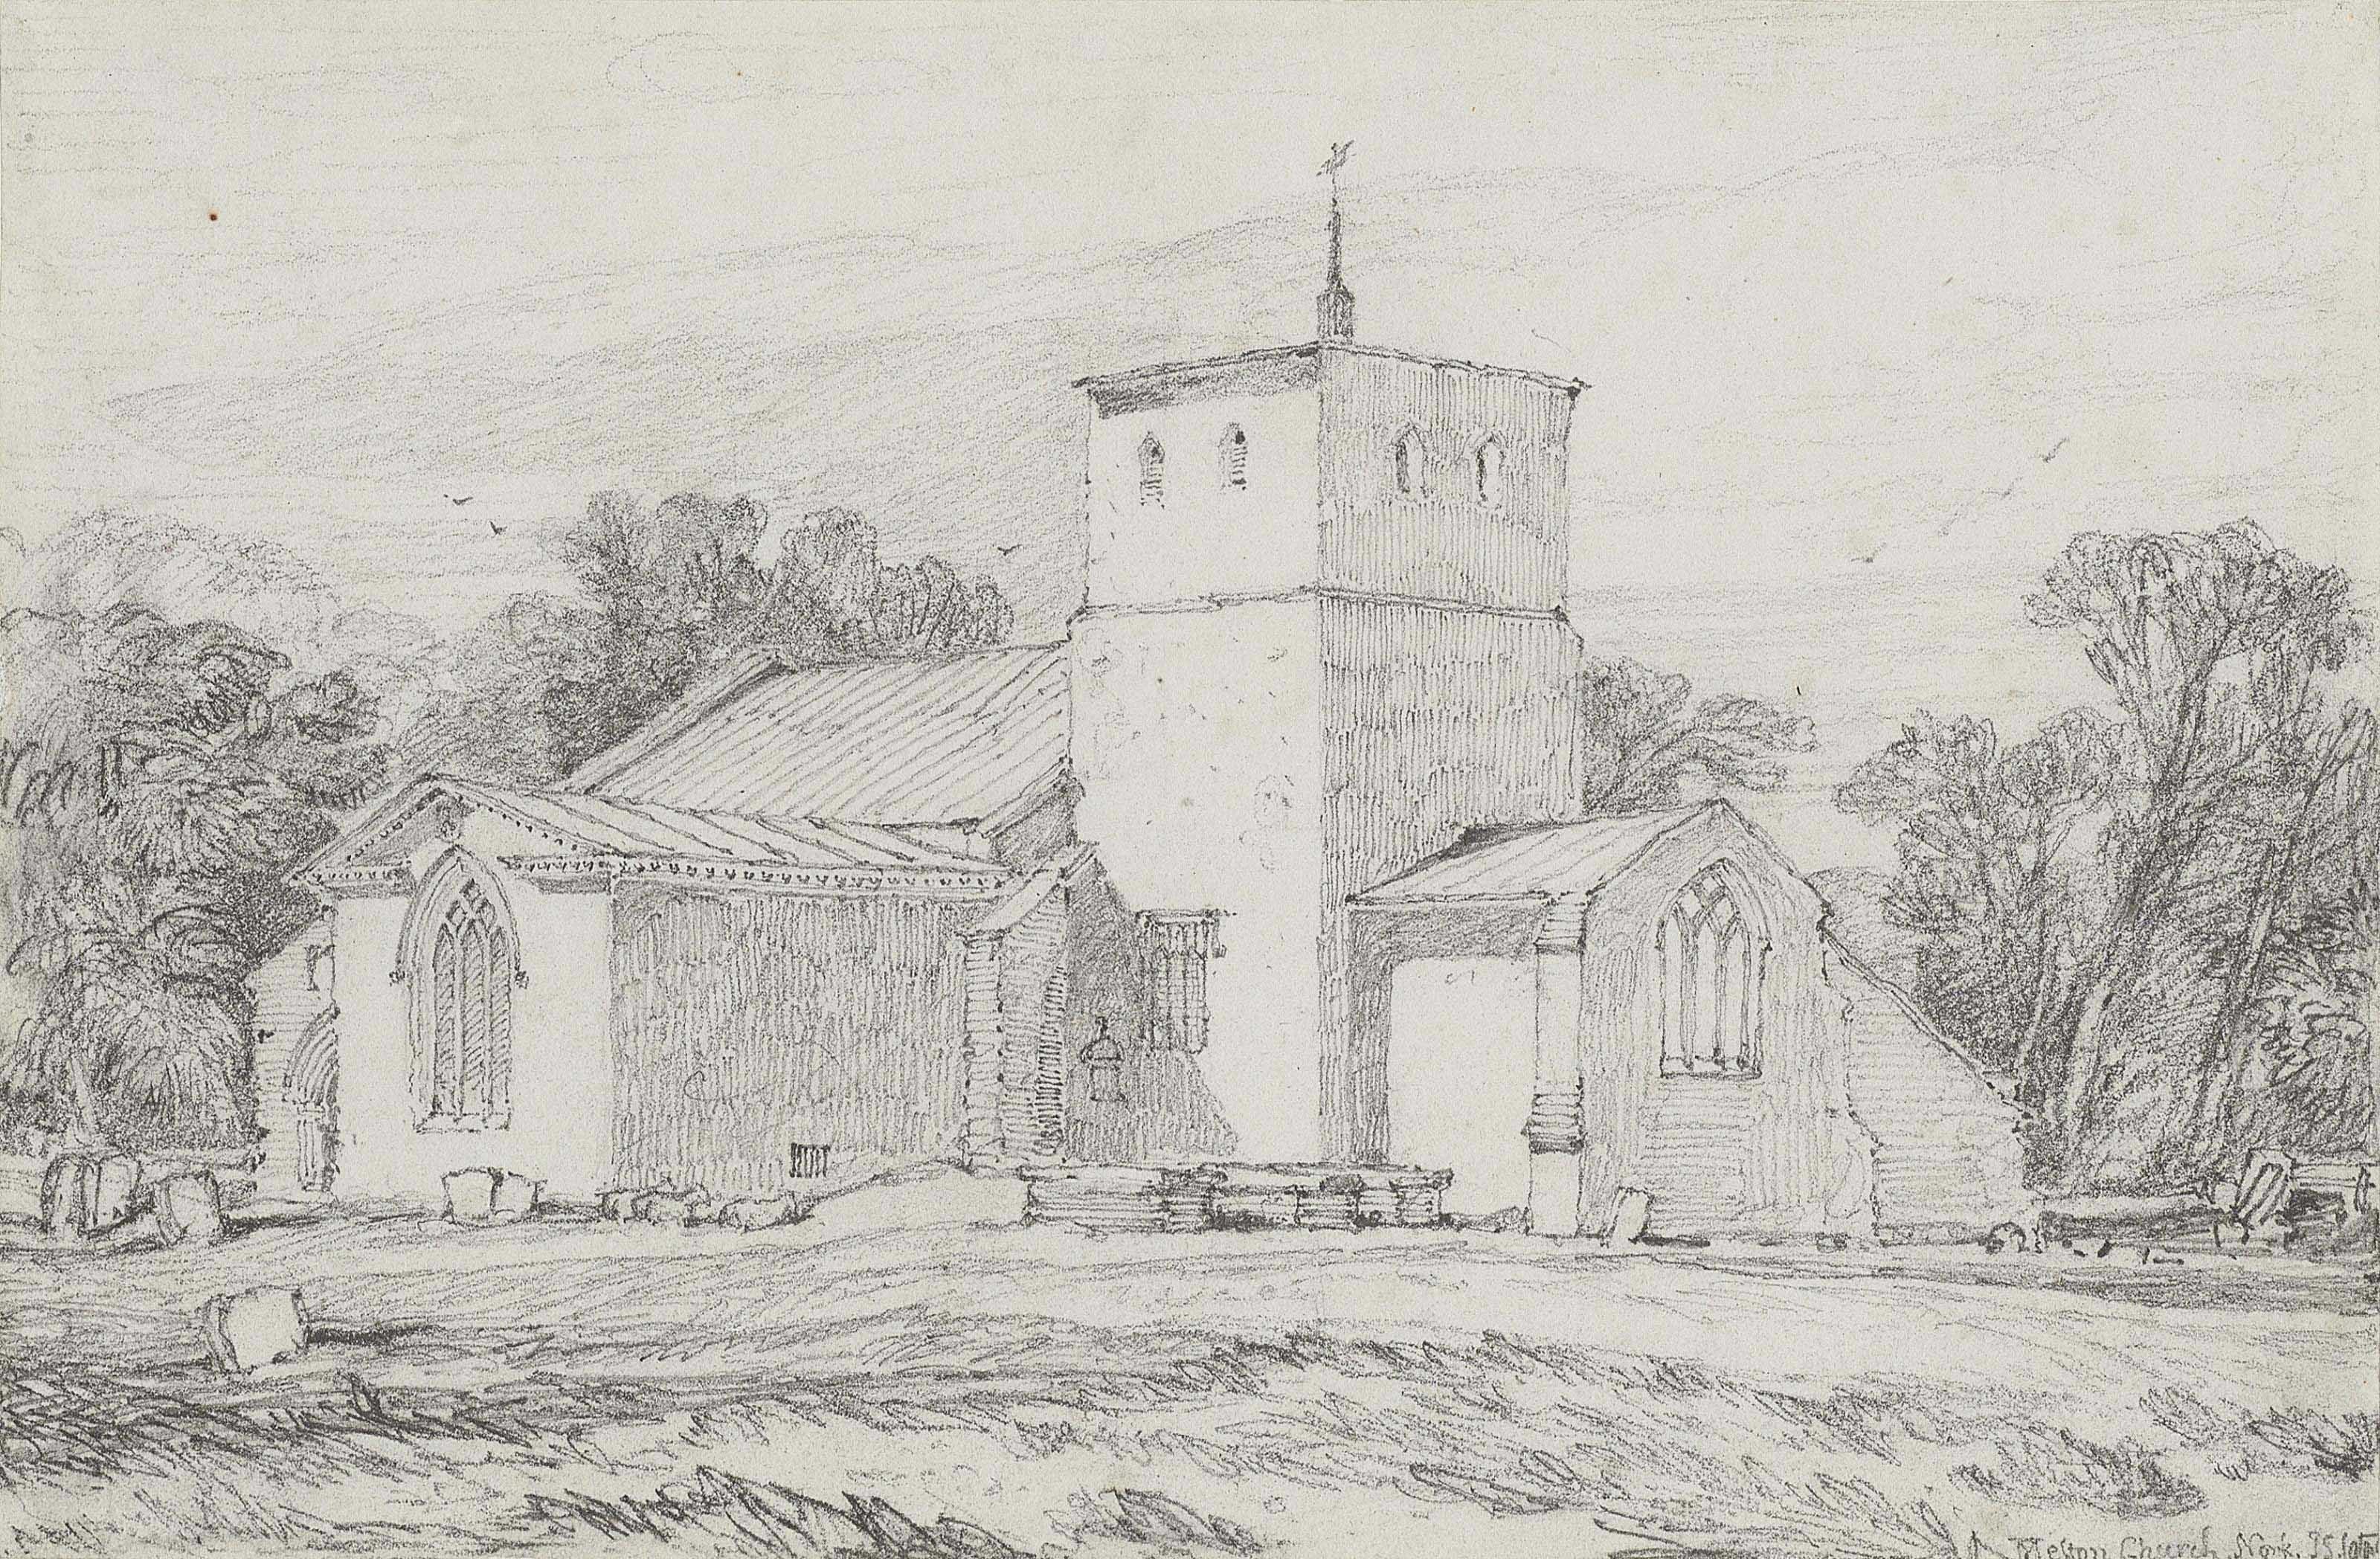 Melton Church, Norfolk